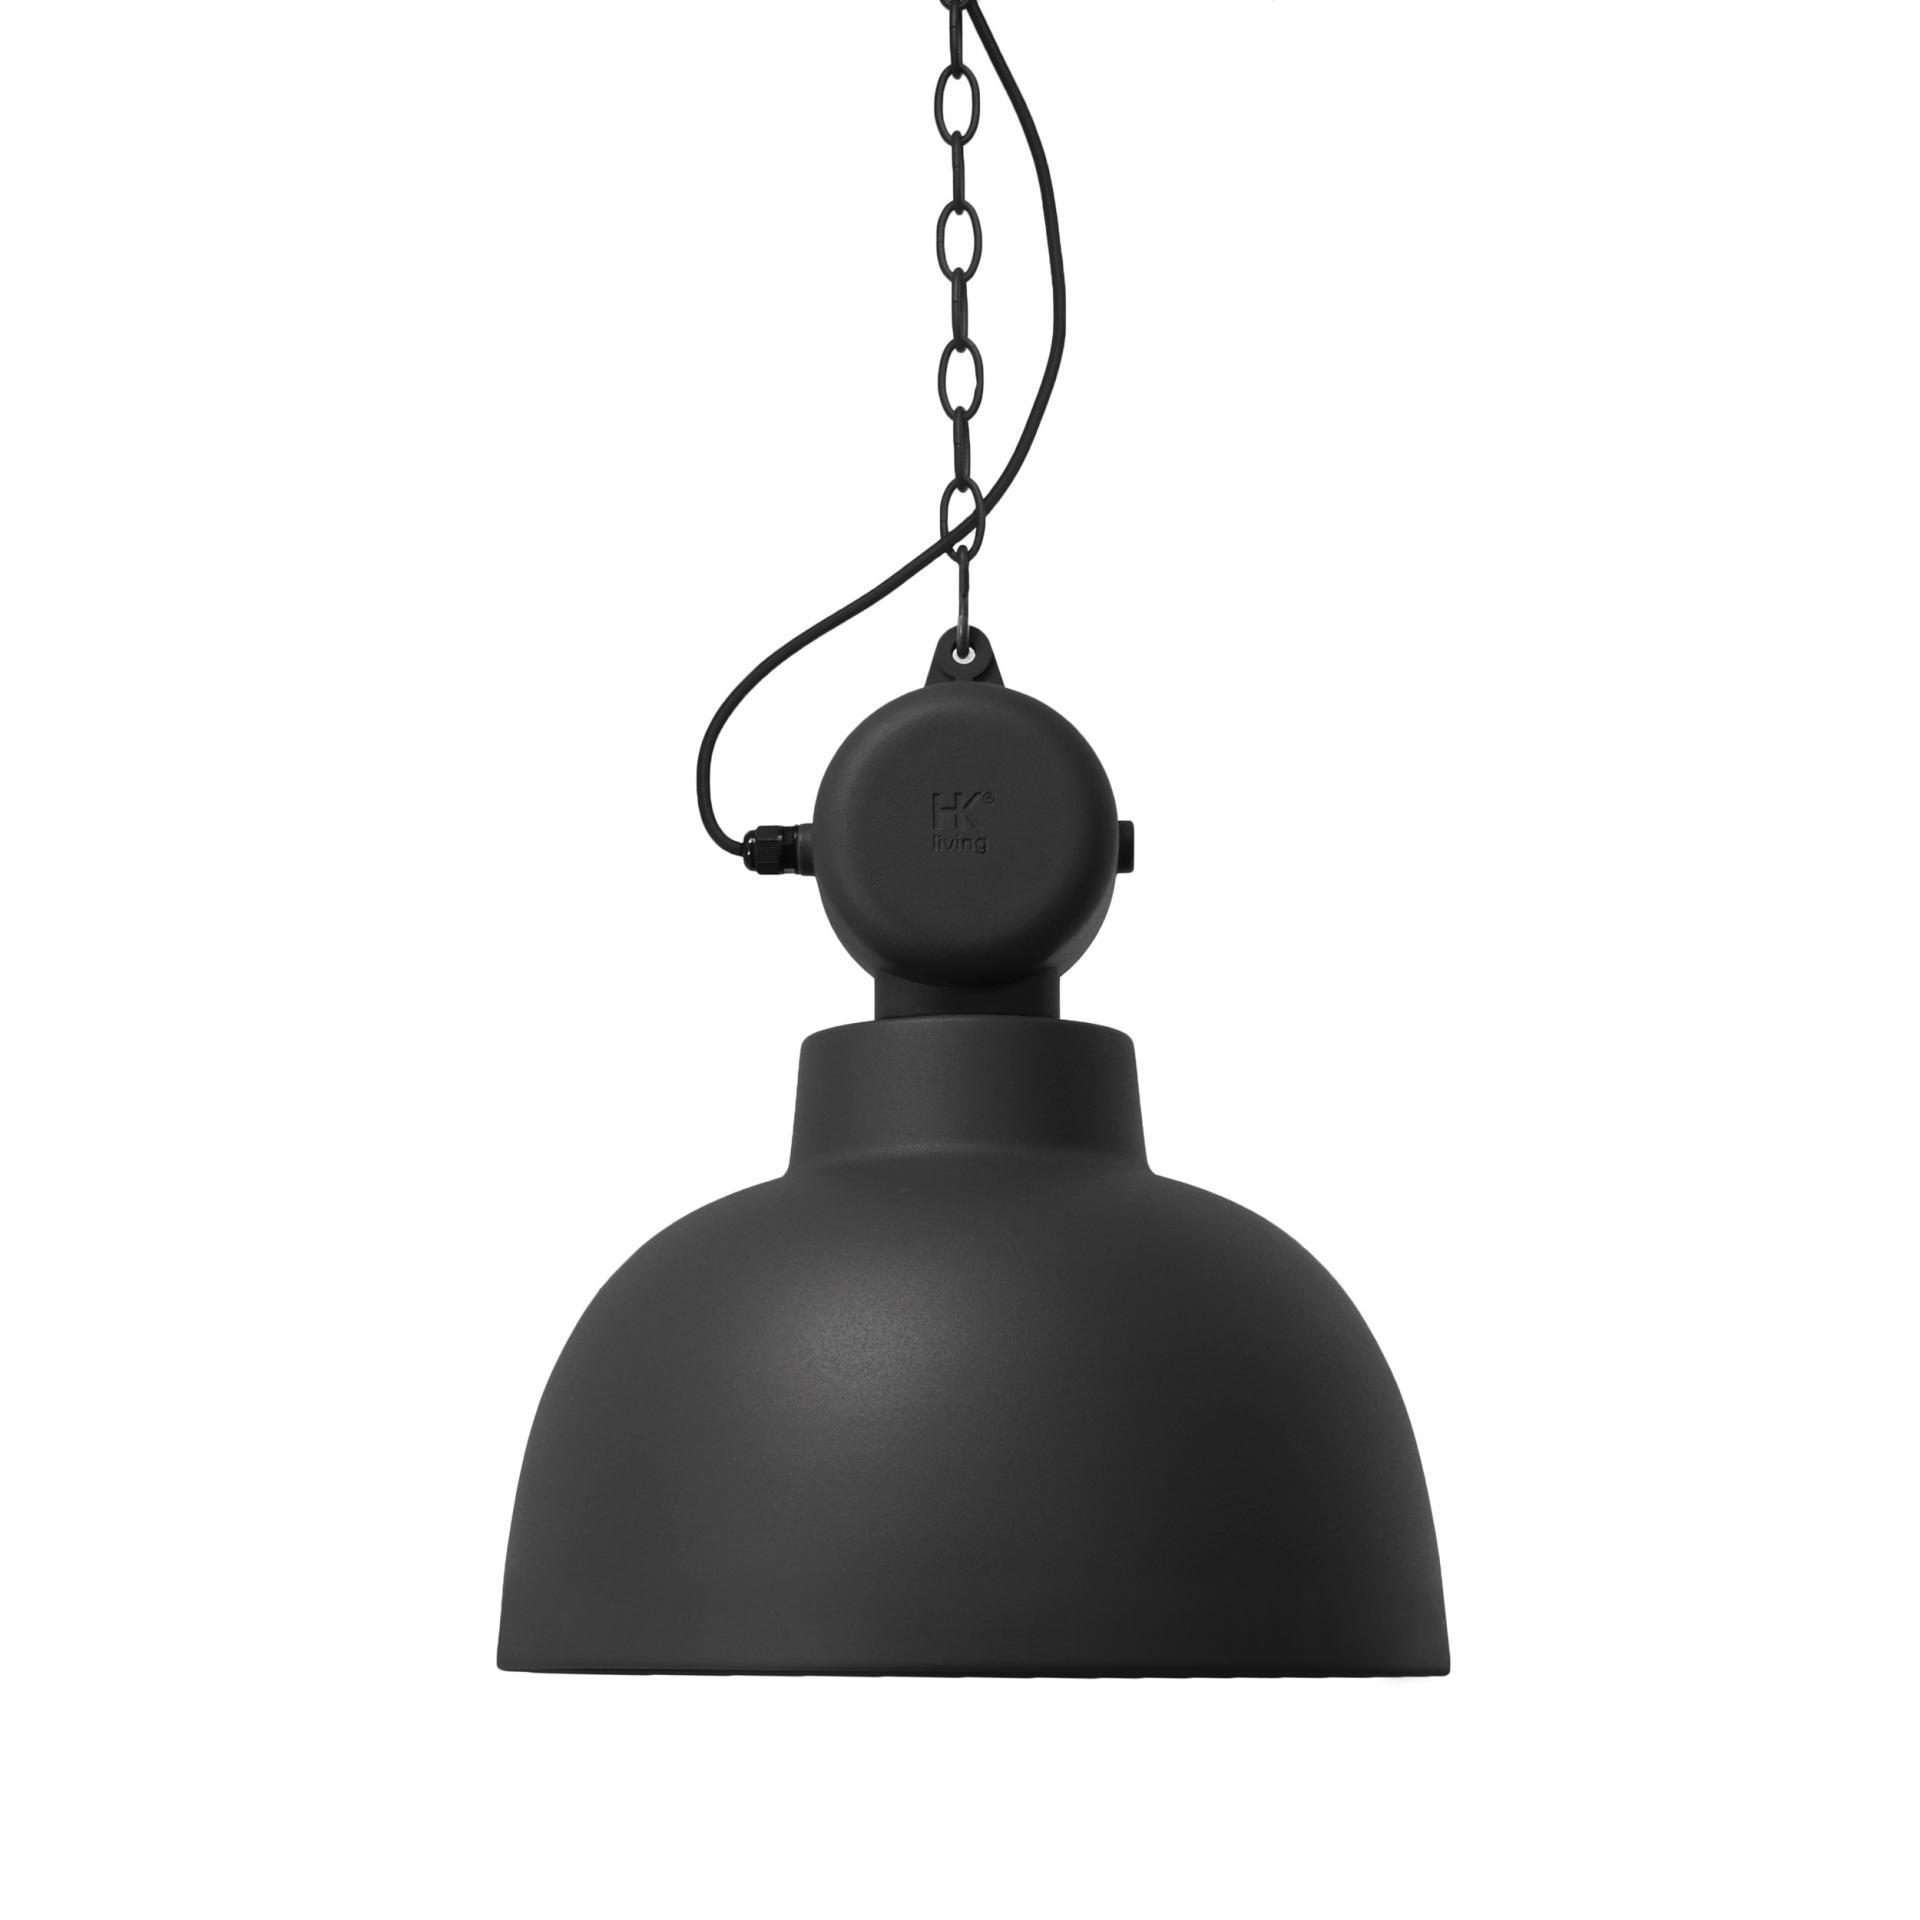 HK living Stropní lampa Factory Design Black Matt, černá barva, kov